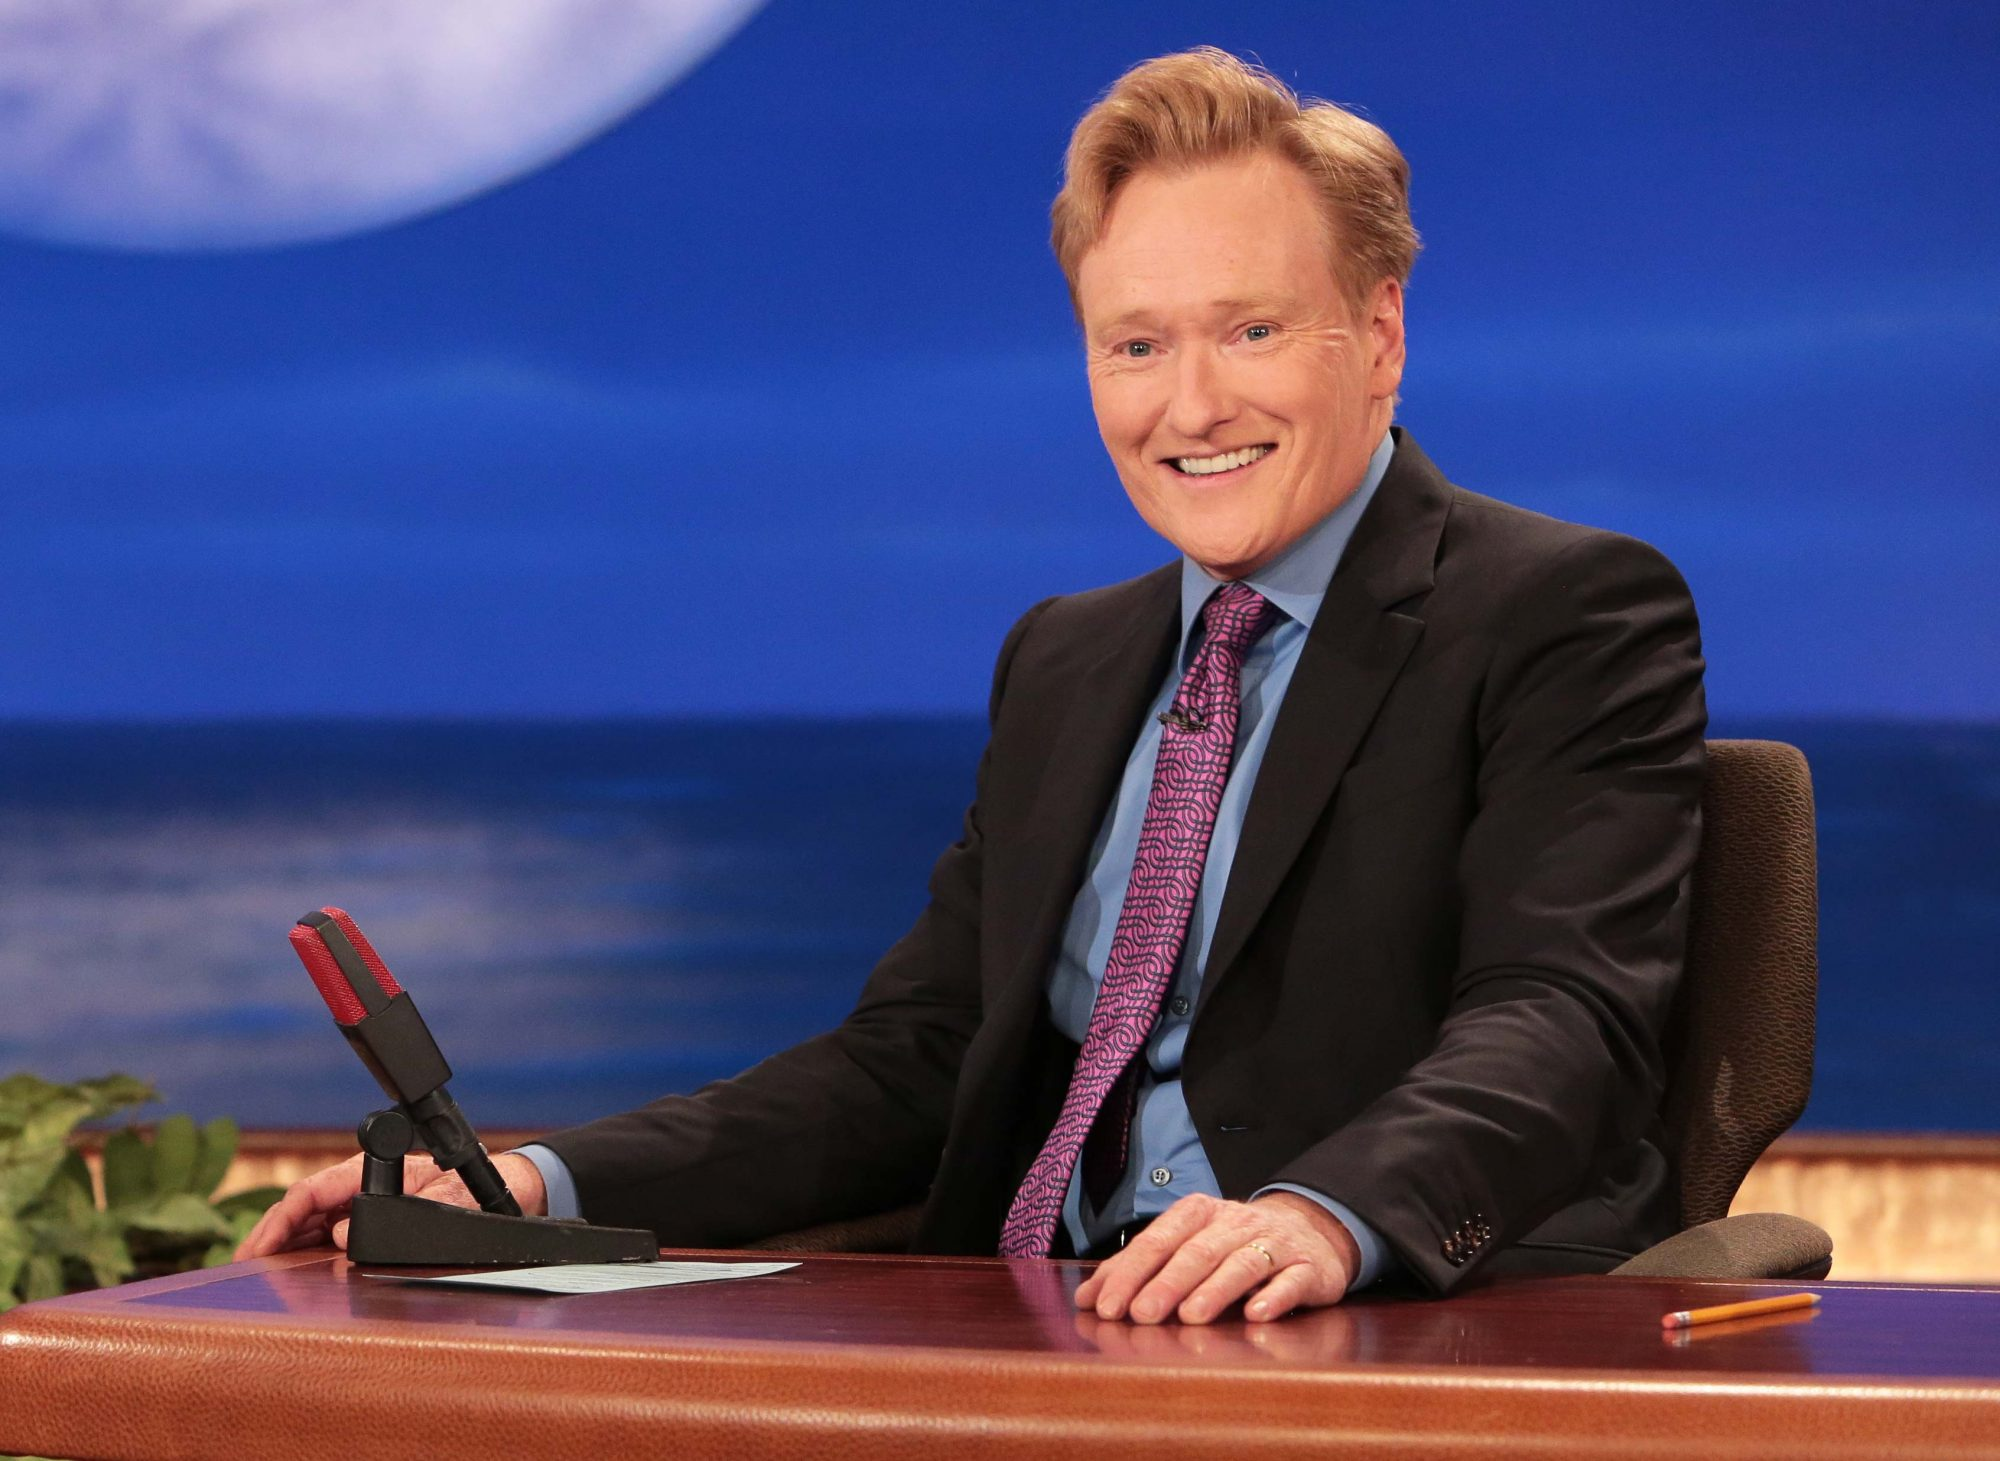 Conan, Episode 0602, August 05, 2014Meghan Sinclair/Conaco, LLC for TBS